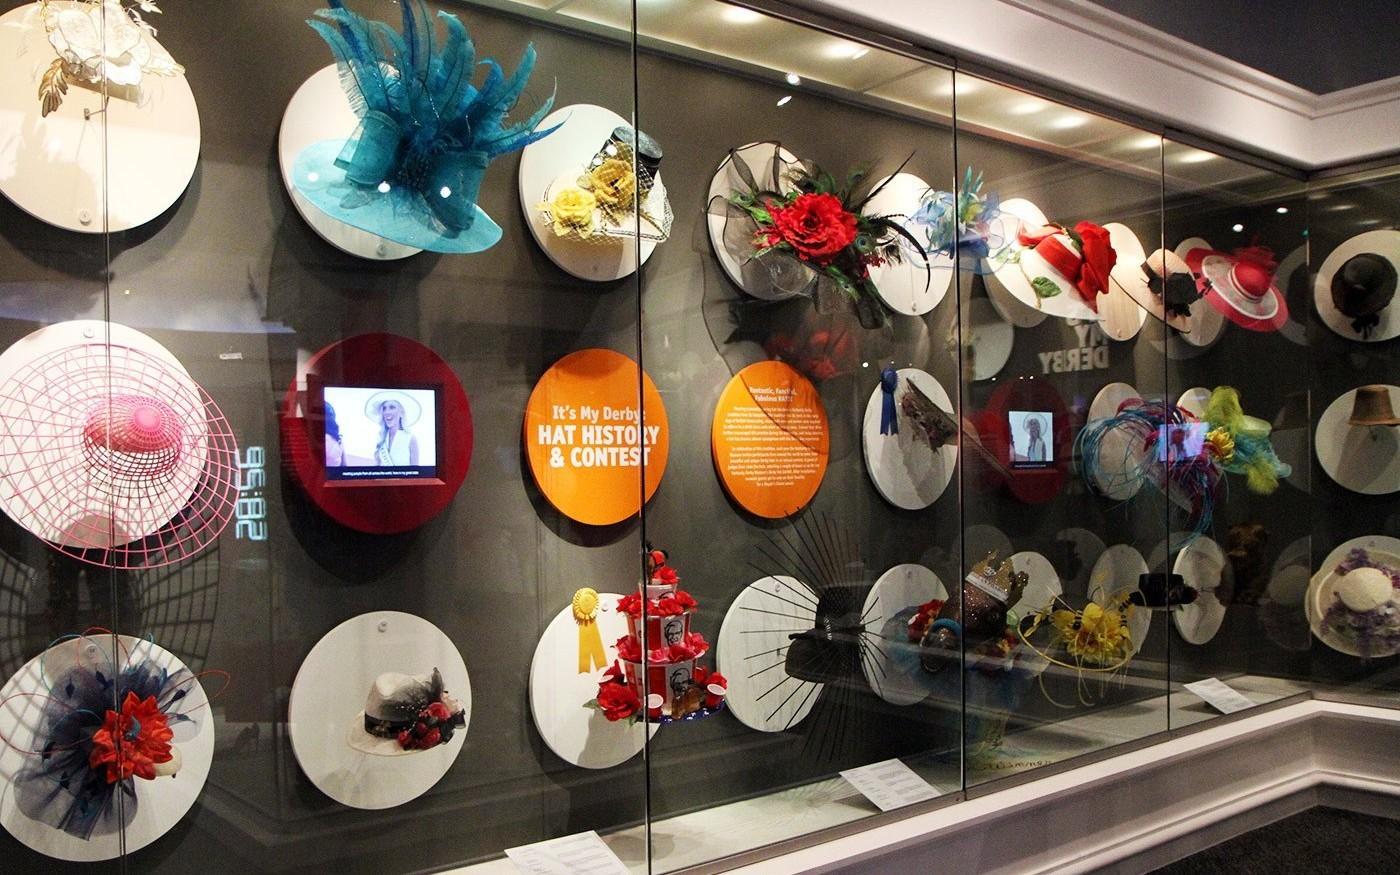 Kentucky Derby Museum's It's My Derby Fashion Exhibit